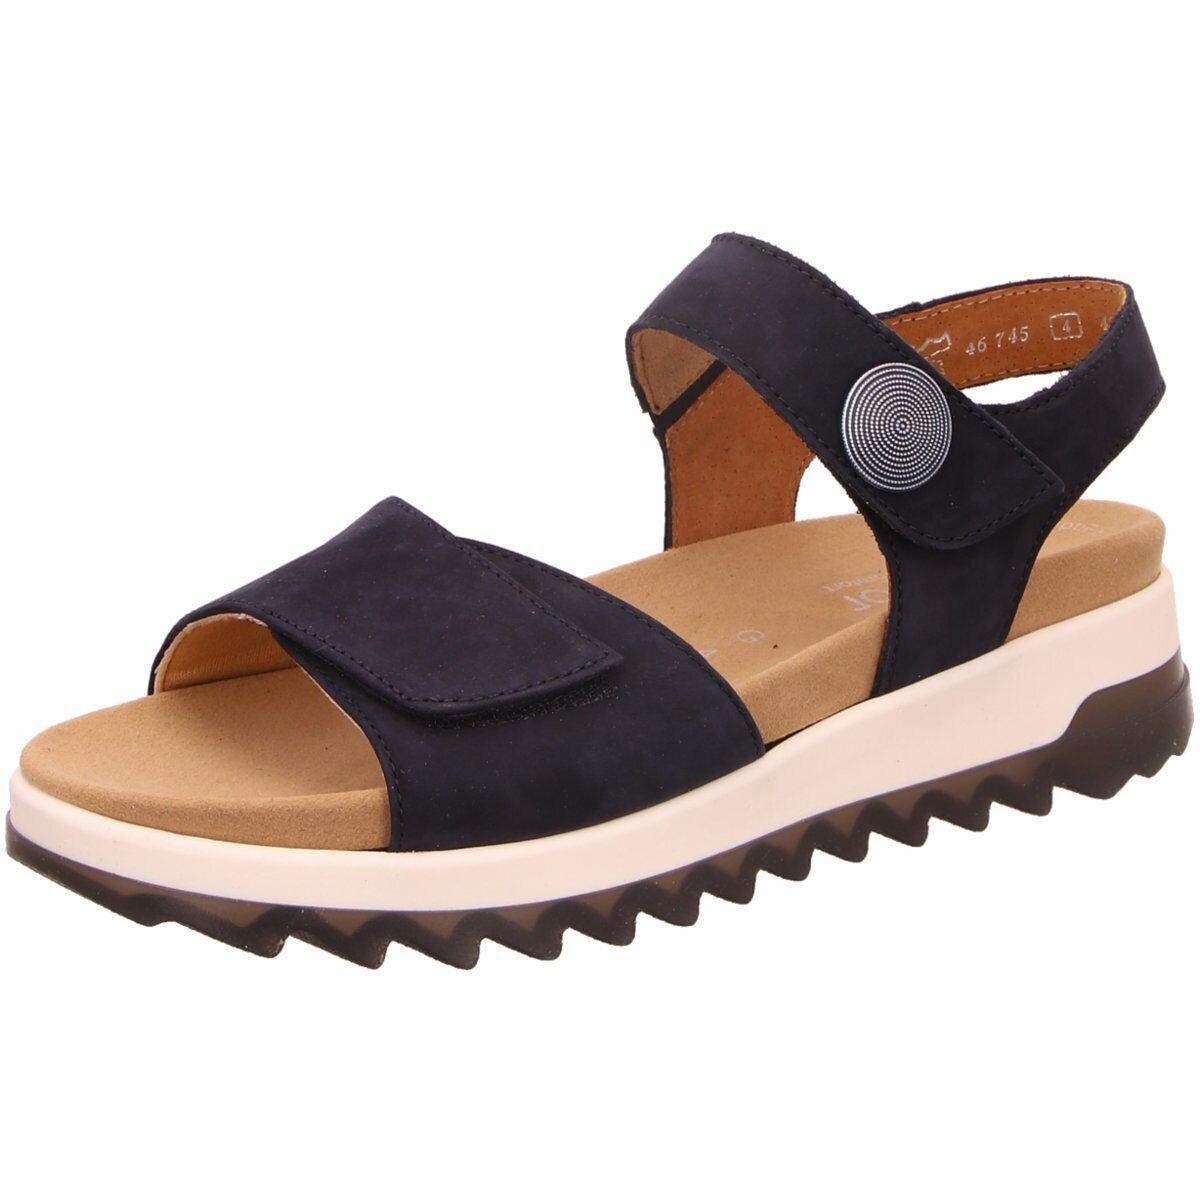 Gabor comfort Damen Sandaletten Florenz 46.745.46 blau 865744